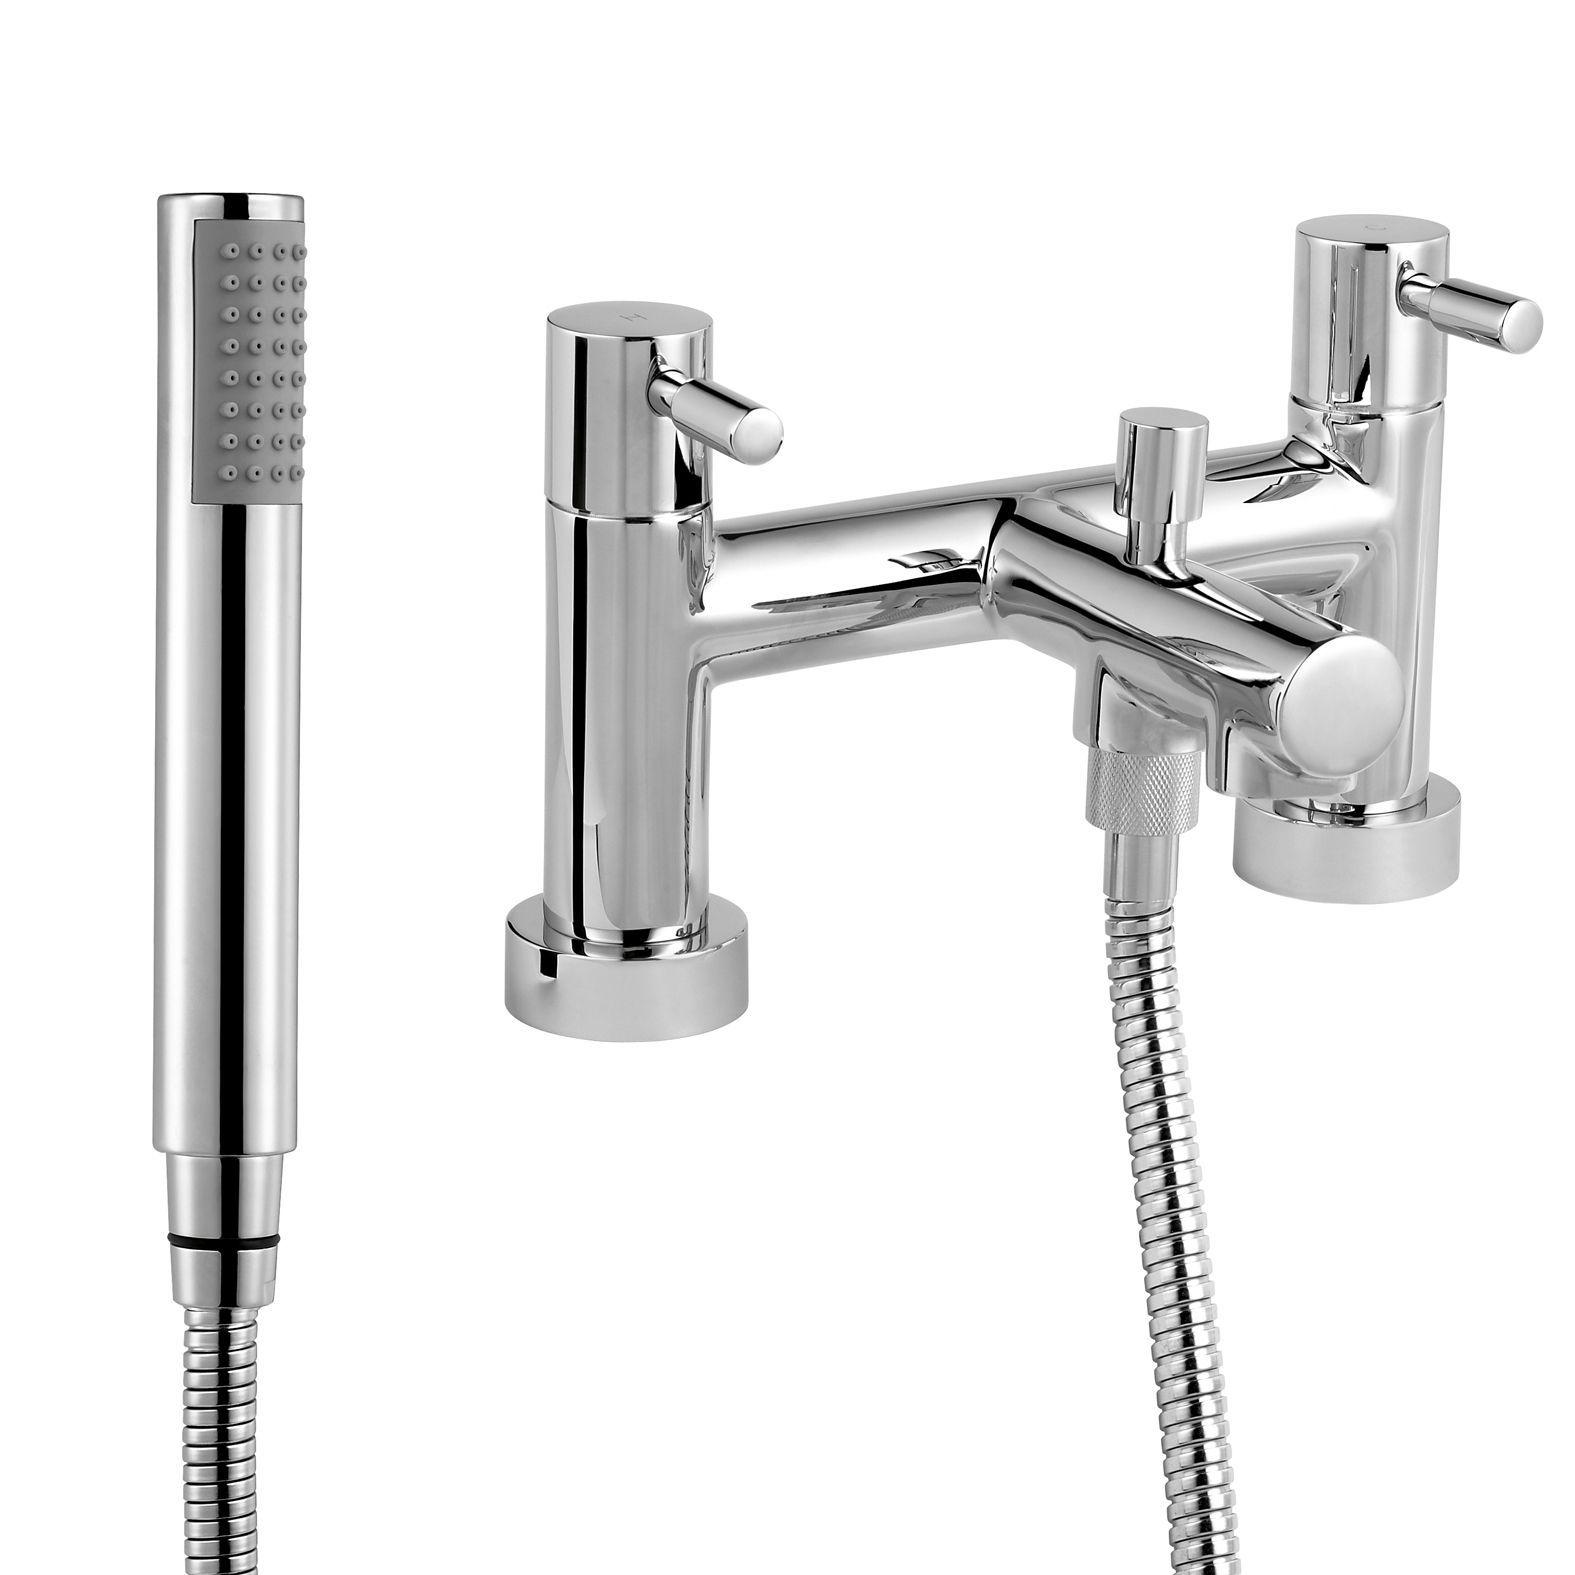 b amp q cirque chrome bath shower mixer tap departments b amp q semi framed bath screen w 750mm departments diy